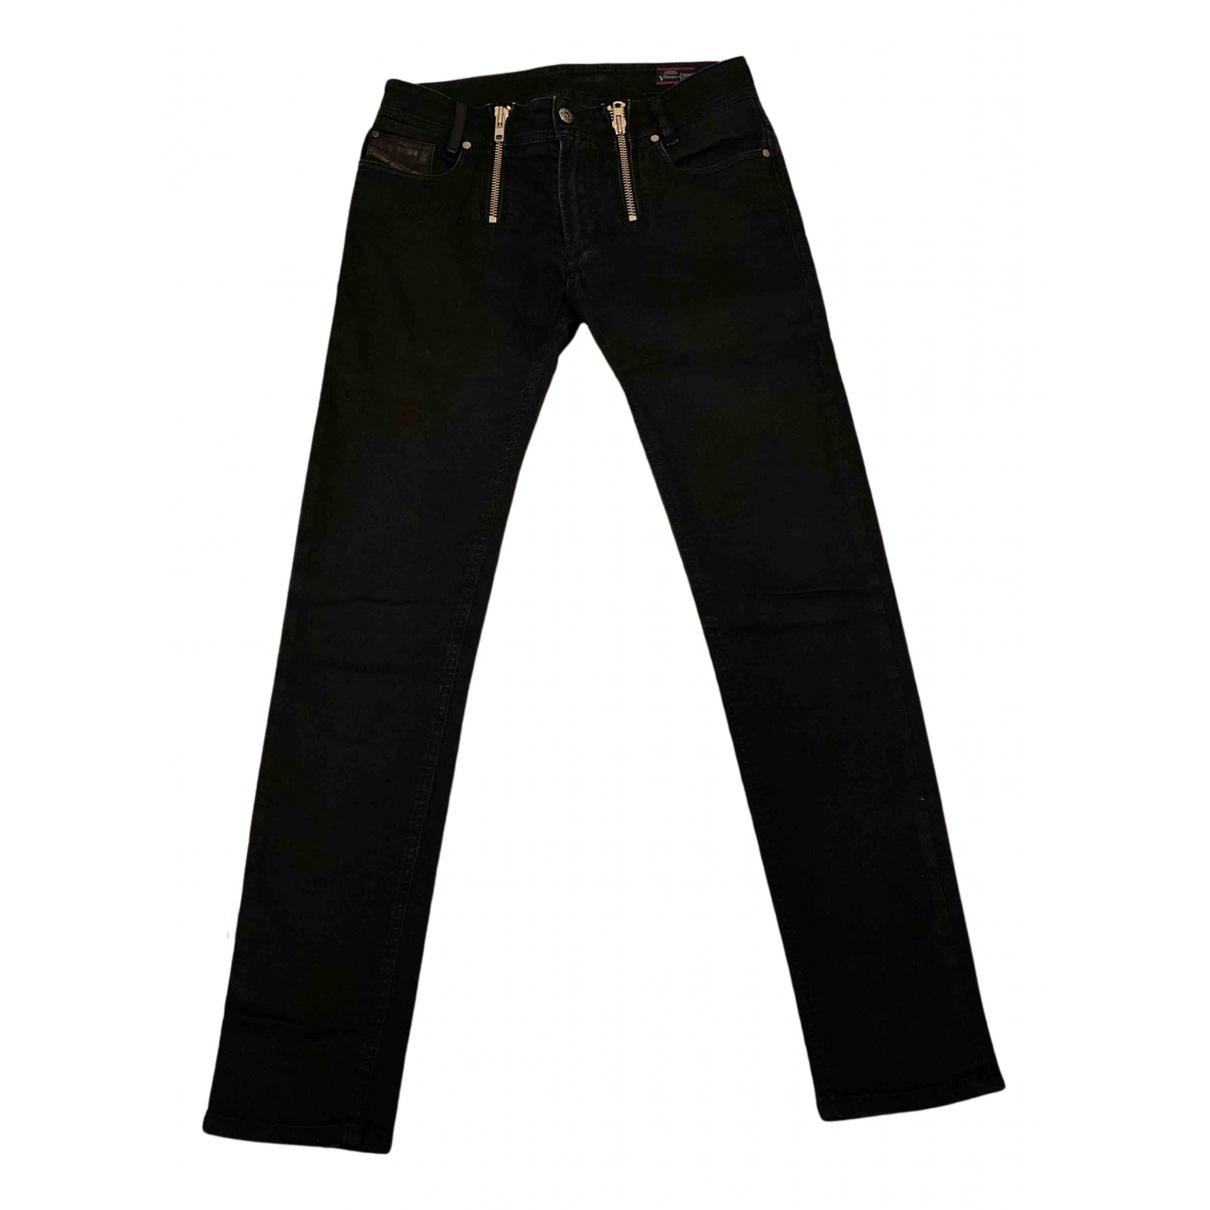 Diesel N Black Cotton - elasthane Jeans for Men 28 US